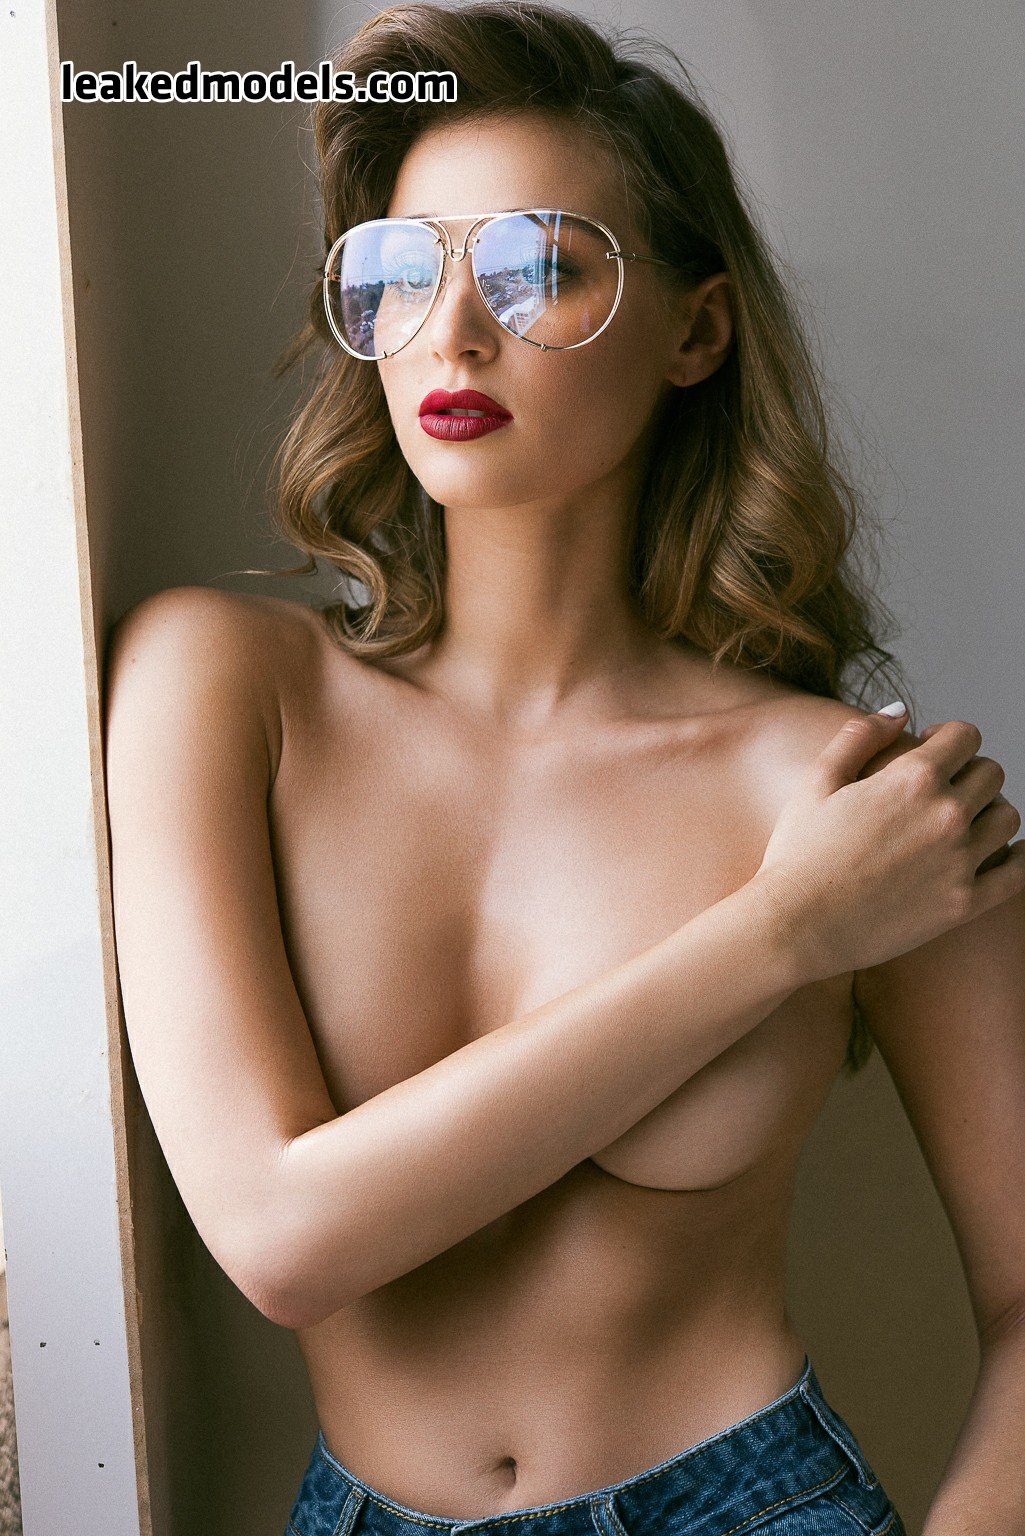 Romi Nest Instagram Nude Leaks (15 Photos)